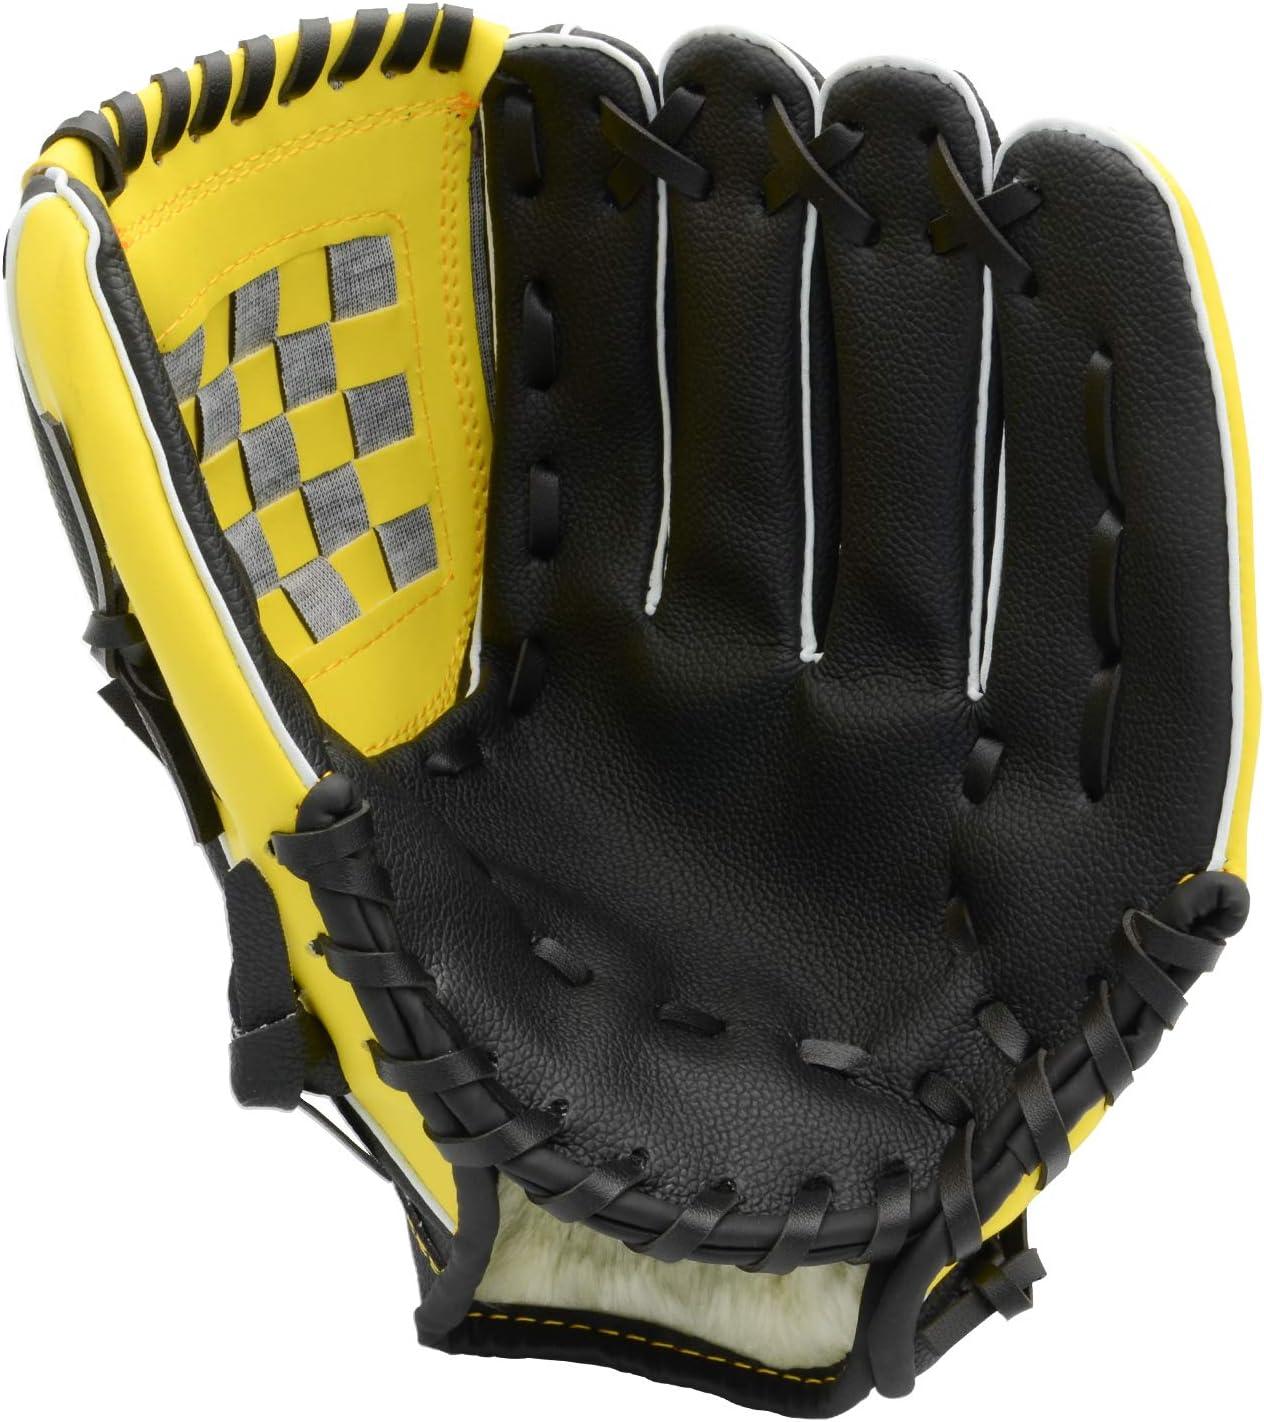 FerDIM Baseball Glove Teeball Glove for Kids/Youth/Adult Right Hand Throw, Left Hand Glove